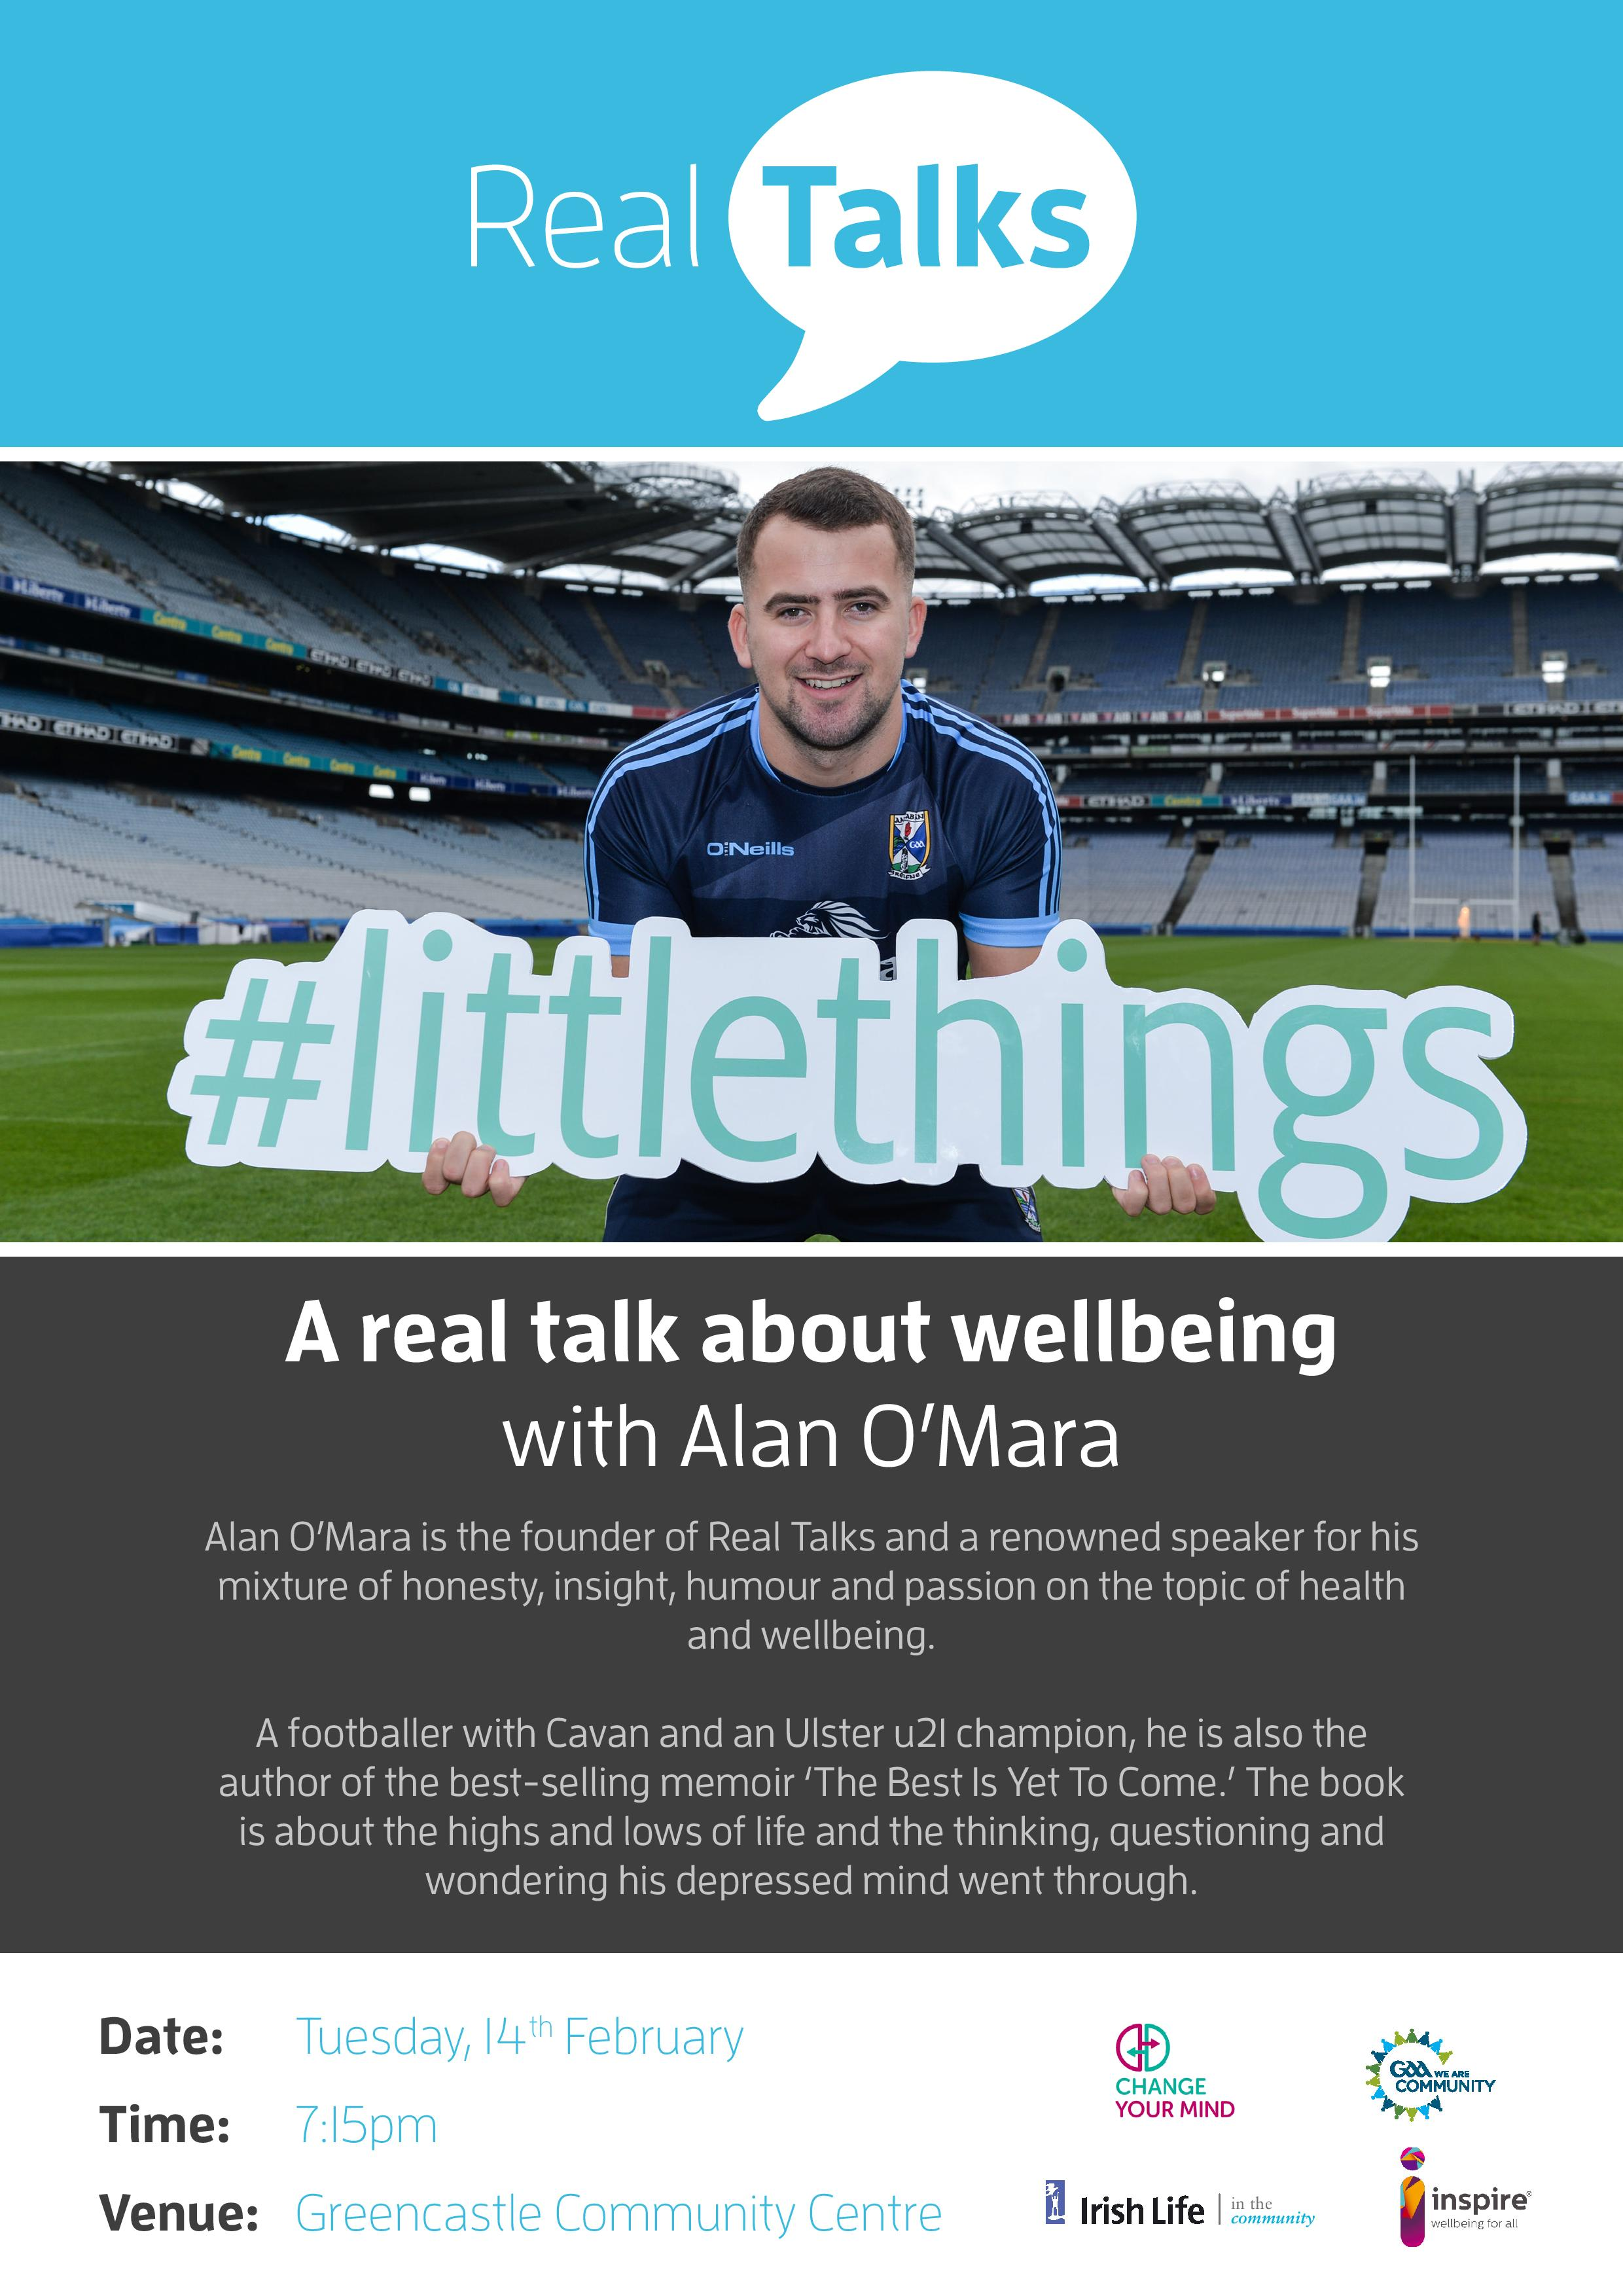 Real Talks with Alan O'Mara in Greencastle